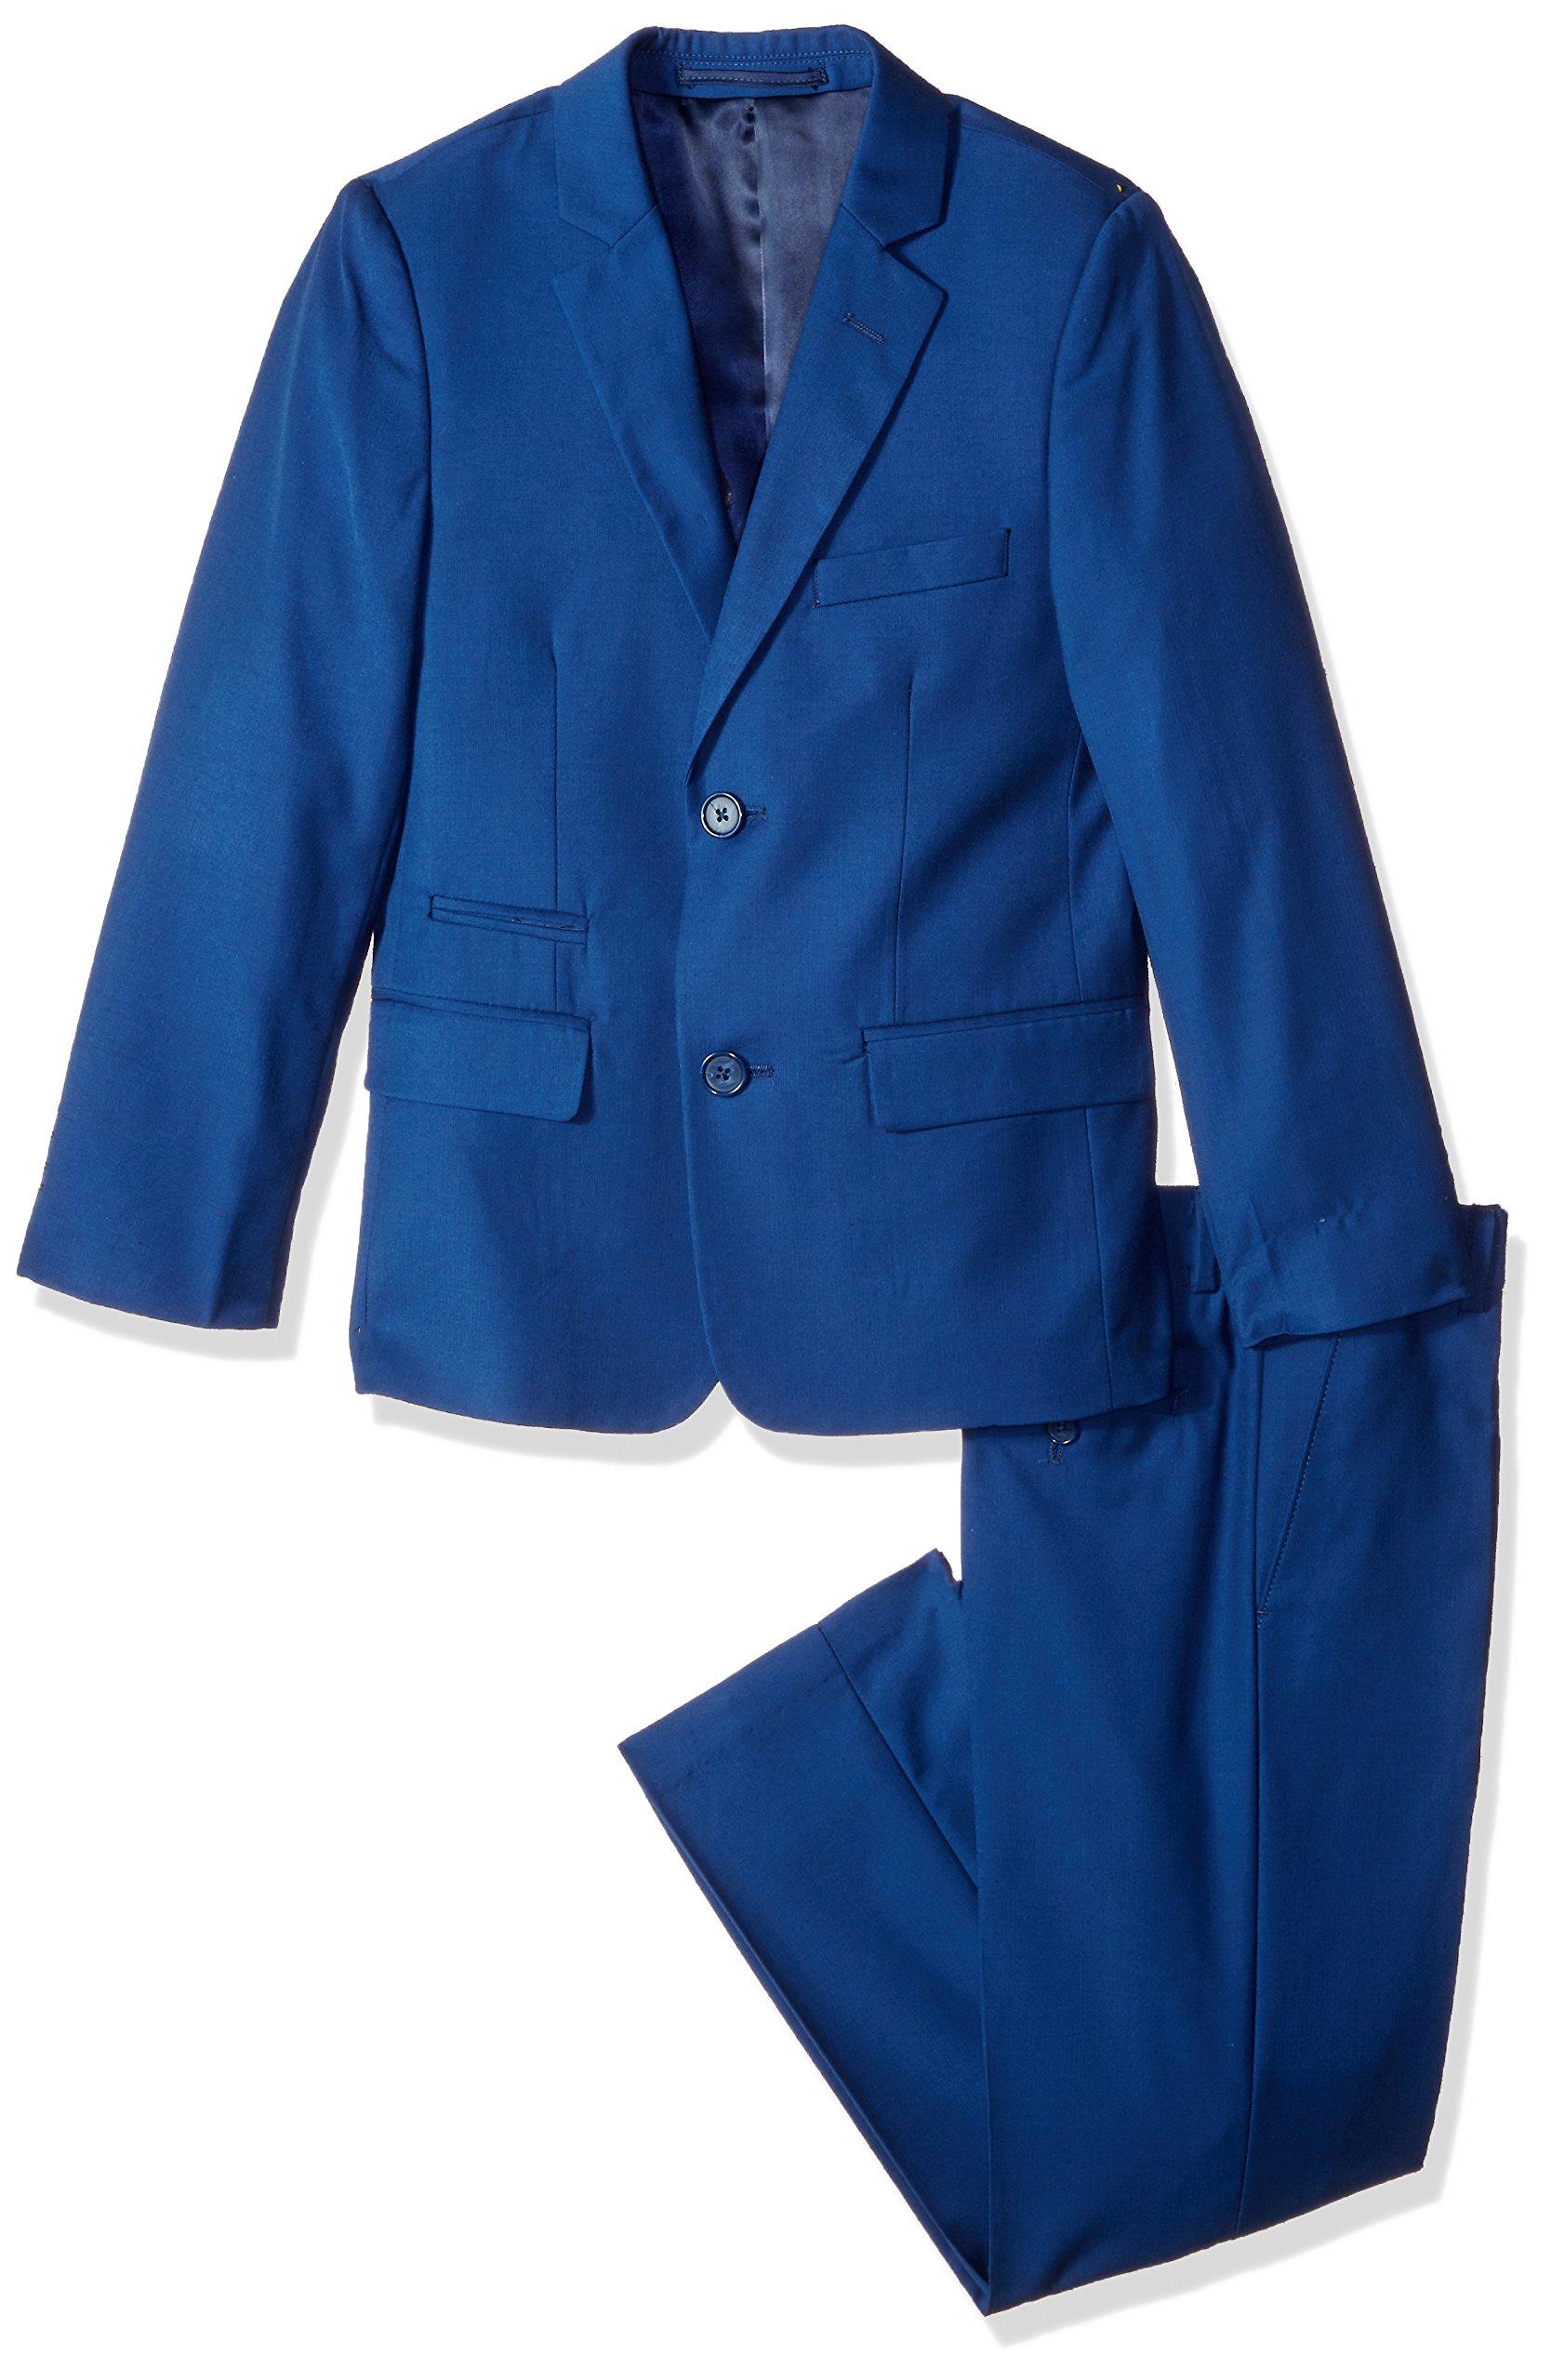 Isaac Mizrahi Big Boys' 2Pc Slim Cut Wool Blend Suit, Cobalt Blue, 10